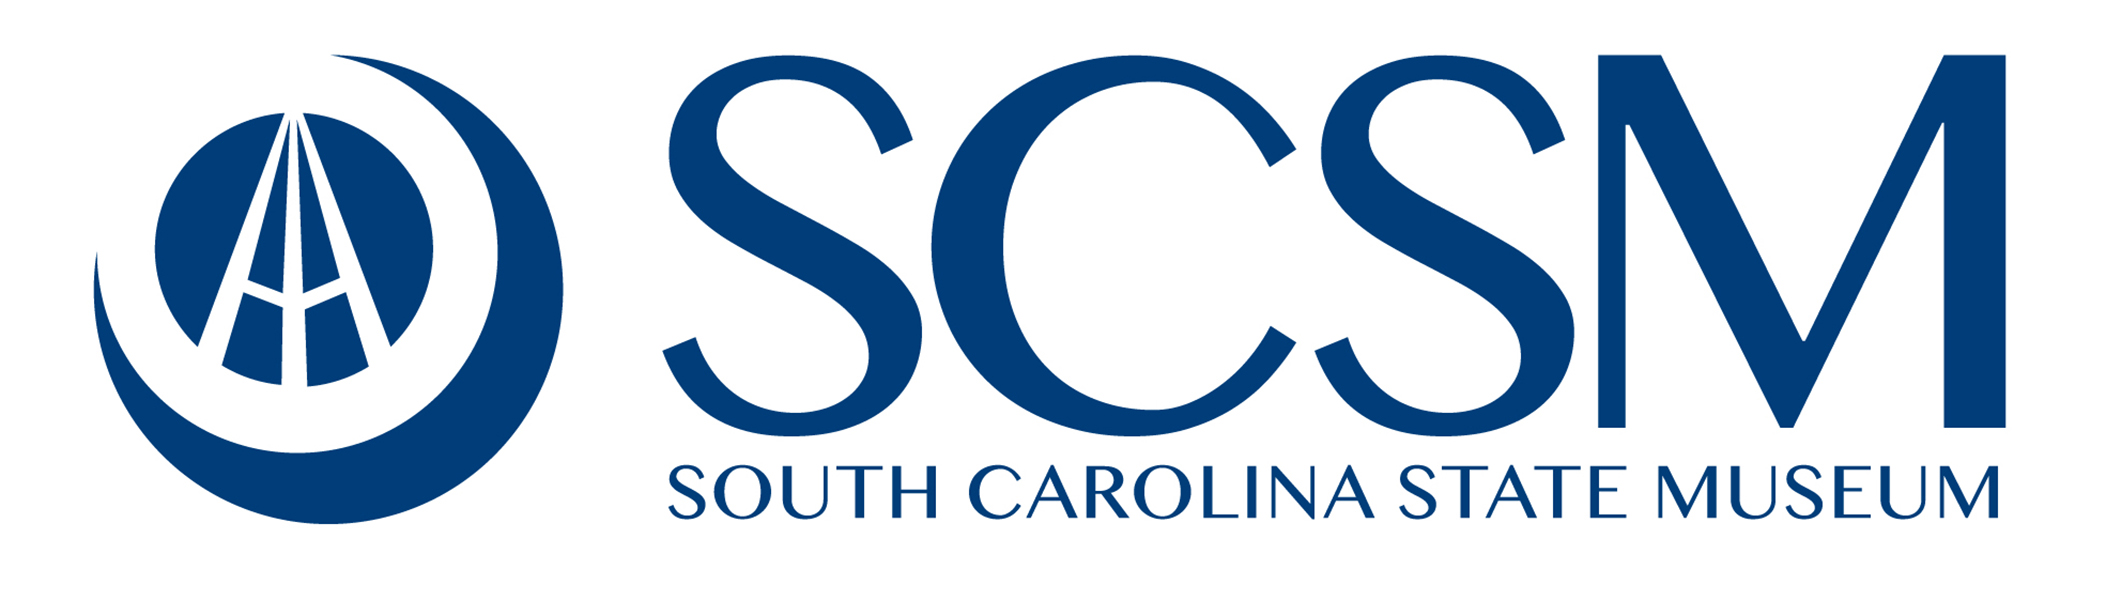 SCSM Logo